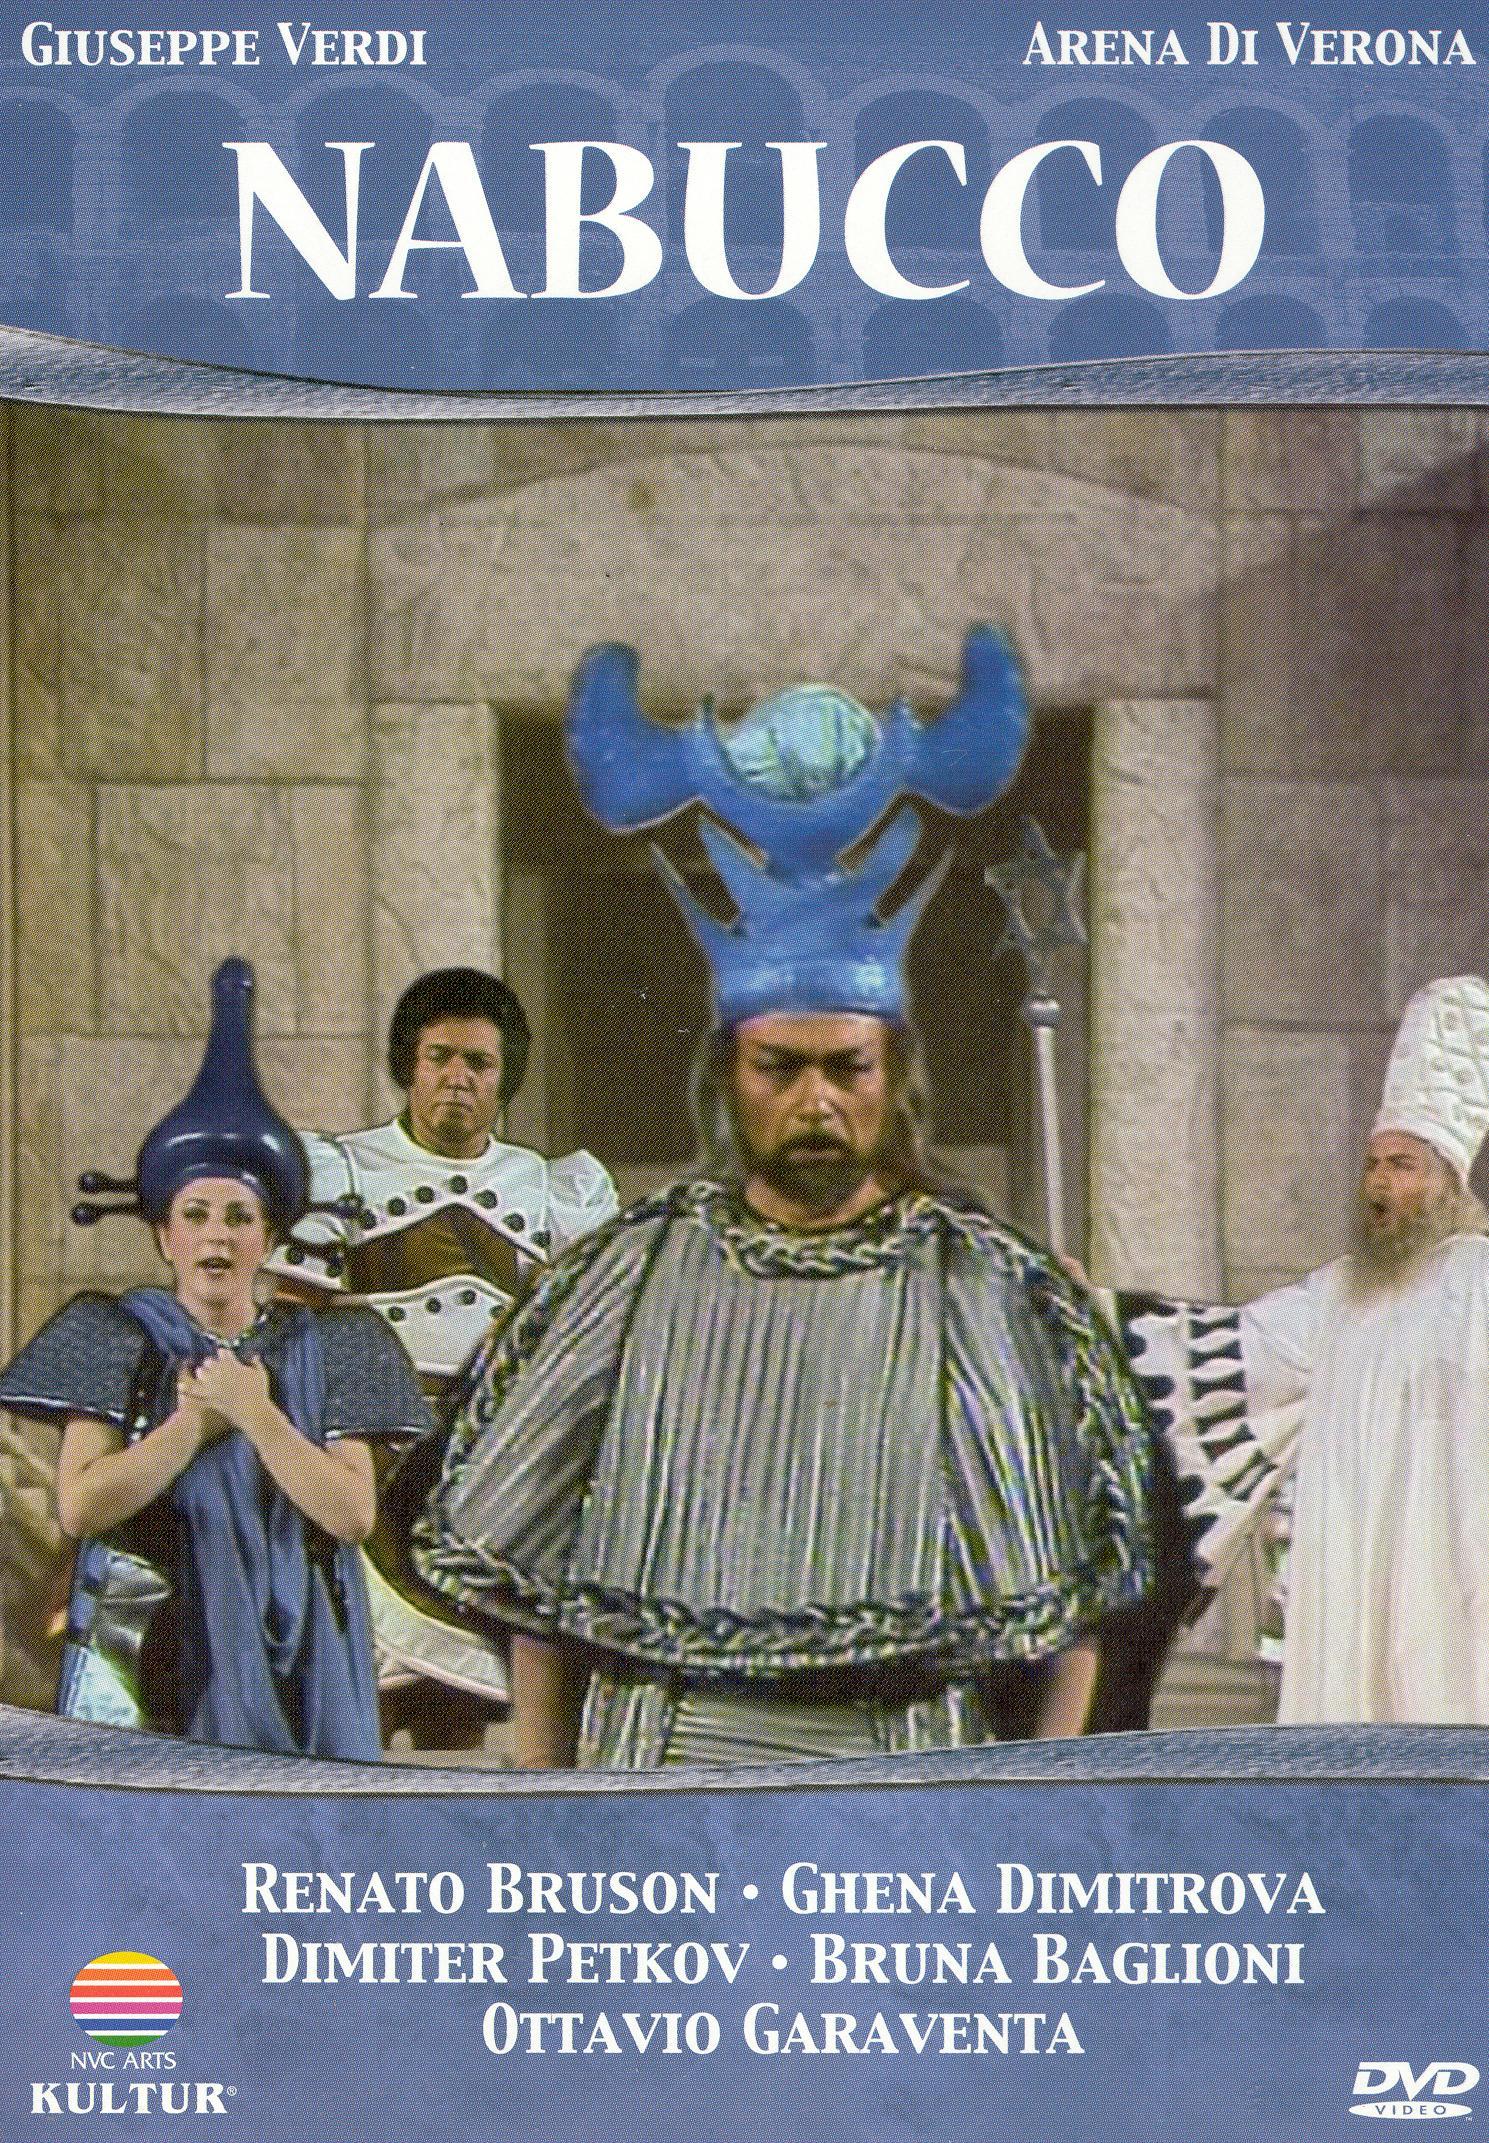 Nabucco (Arena di Verona/Arena)